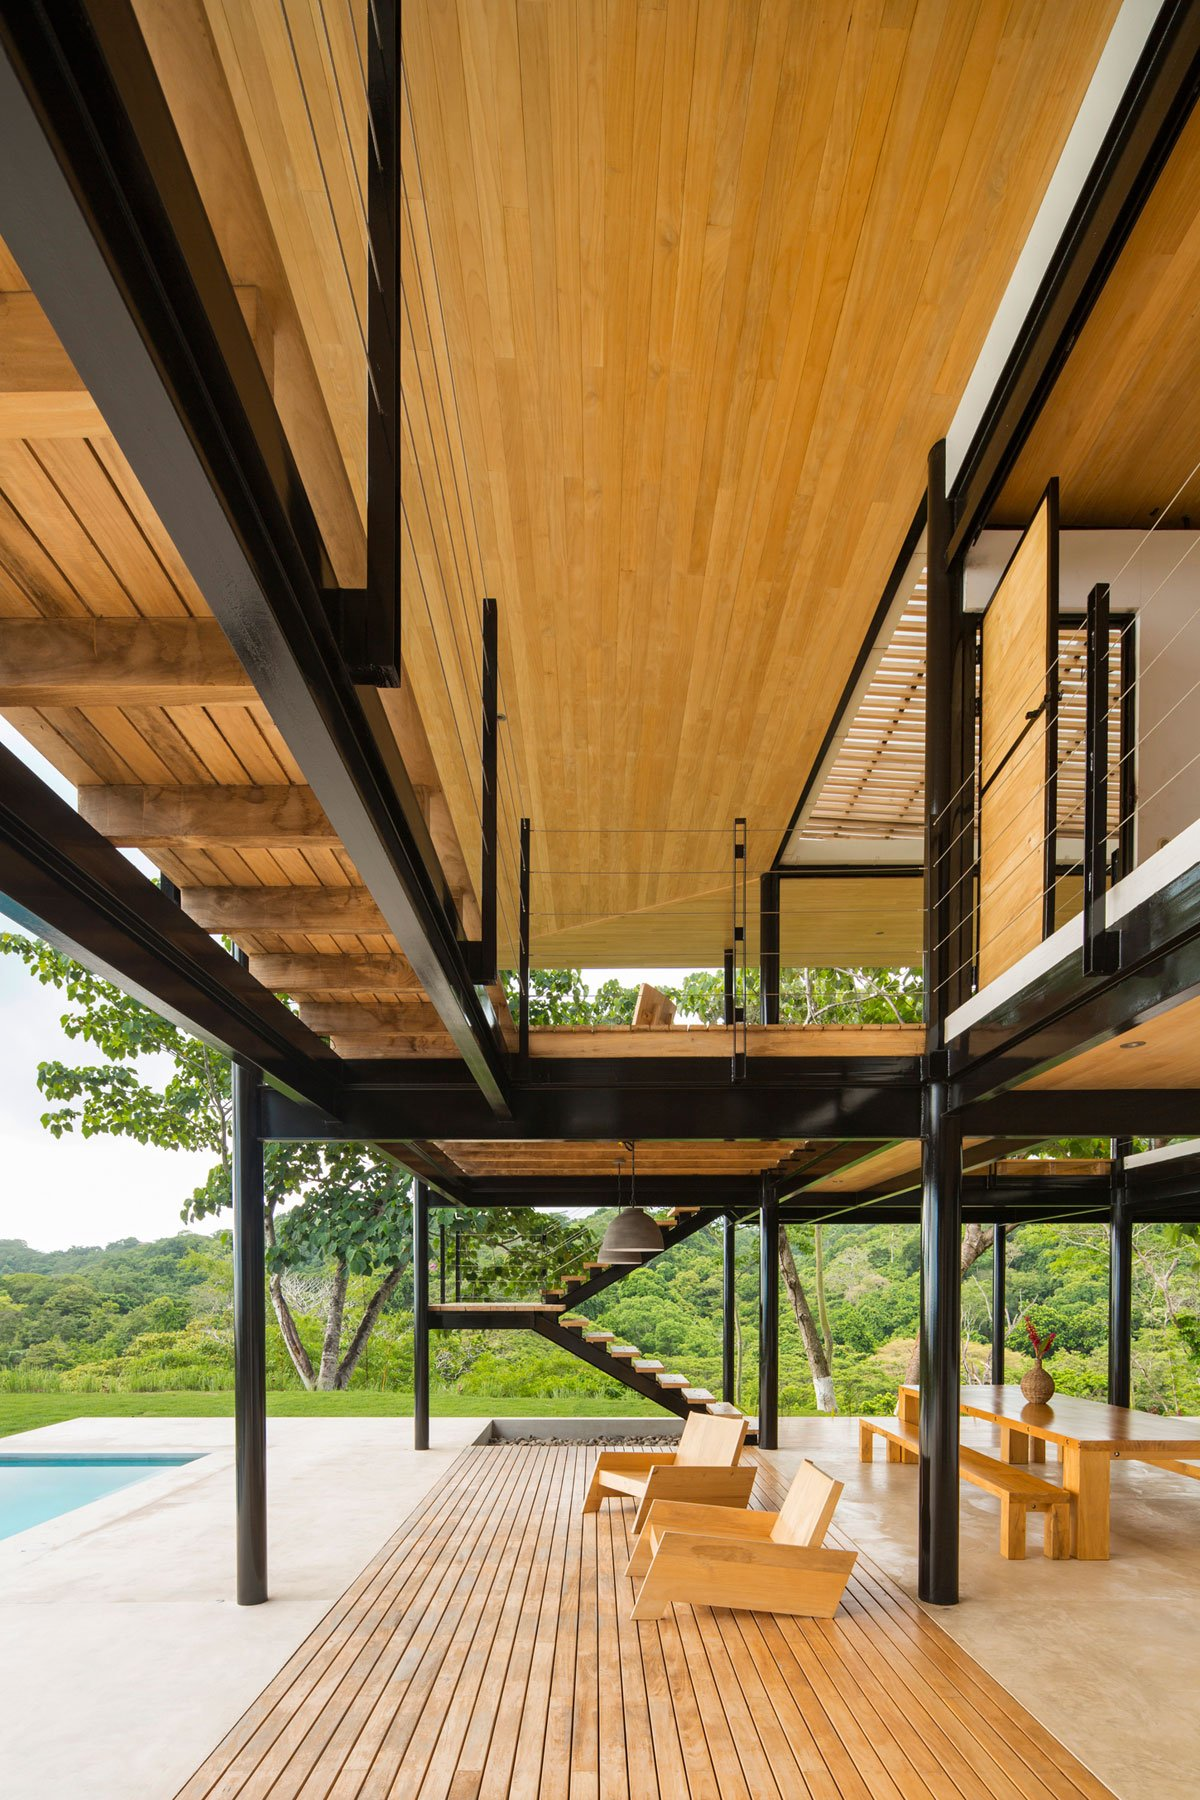 Отделка фасада частного дома деревом